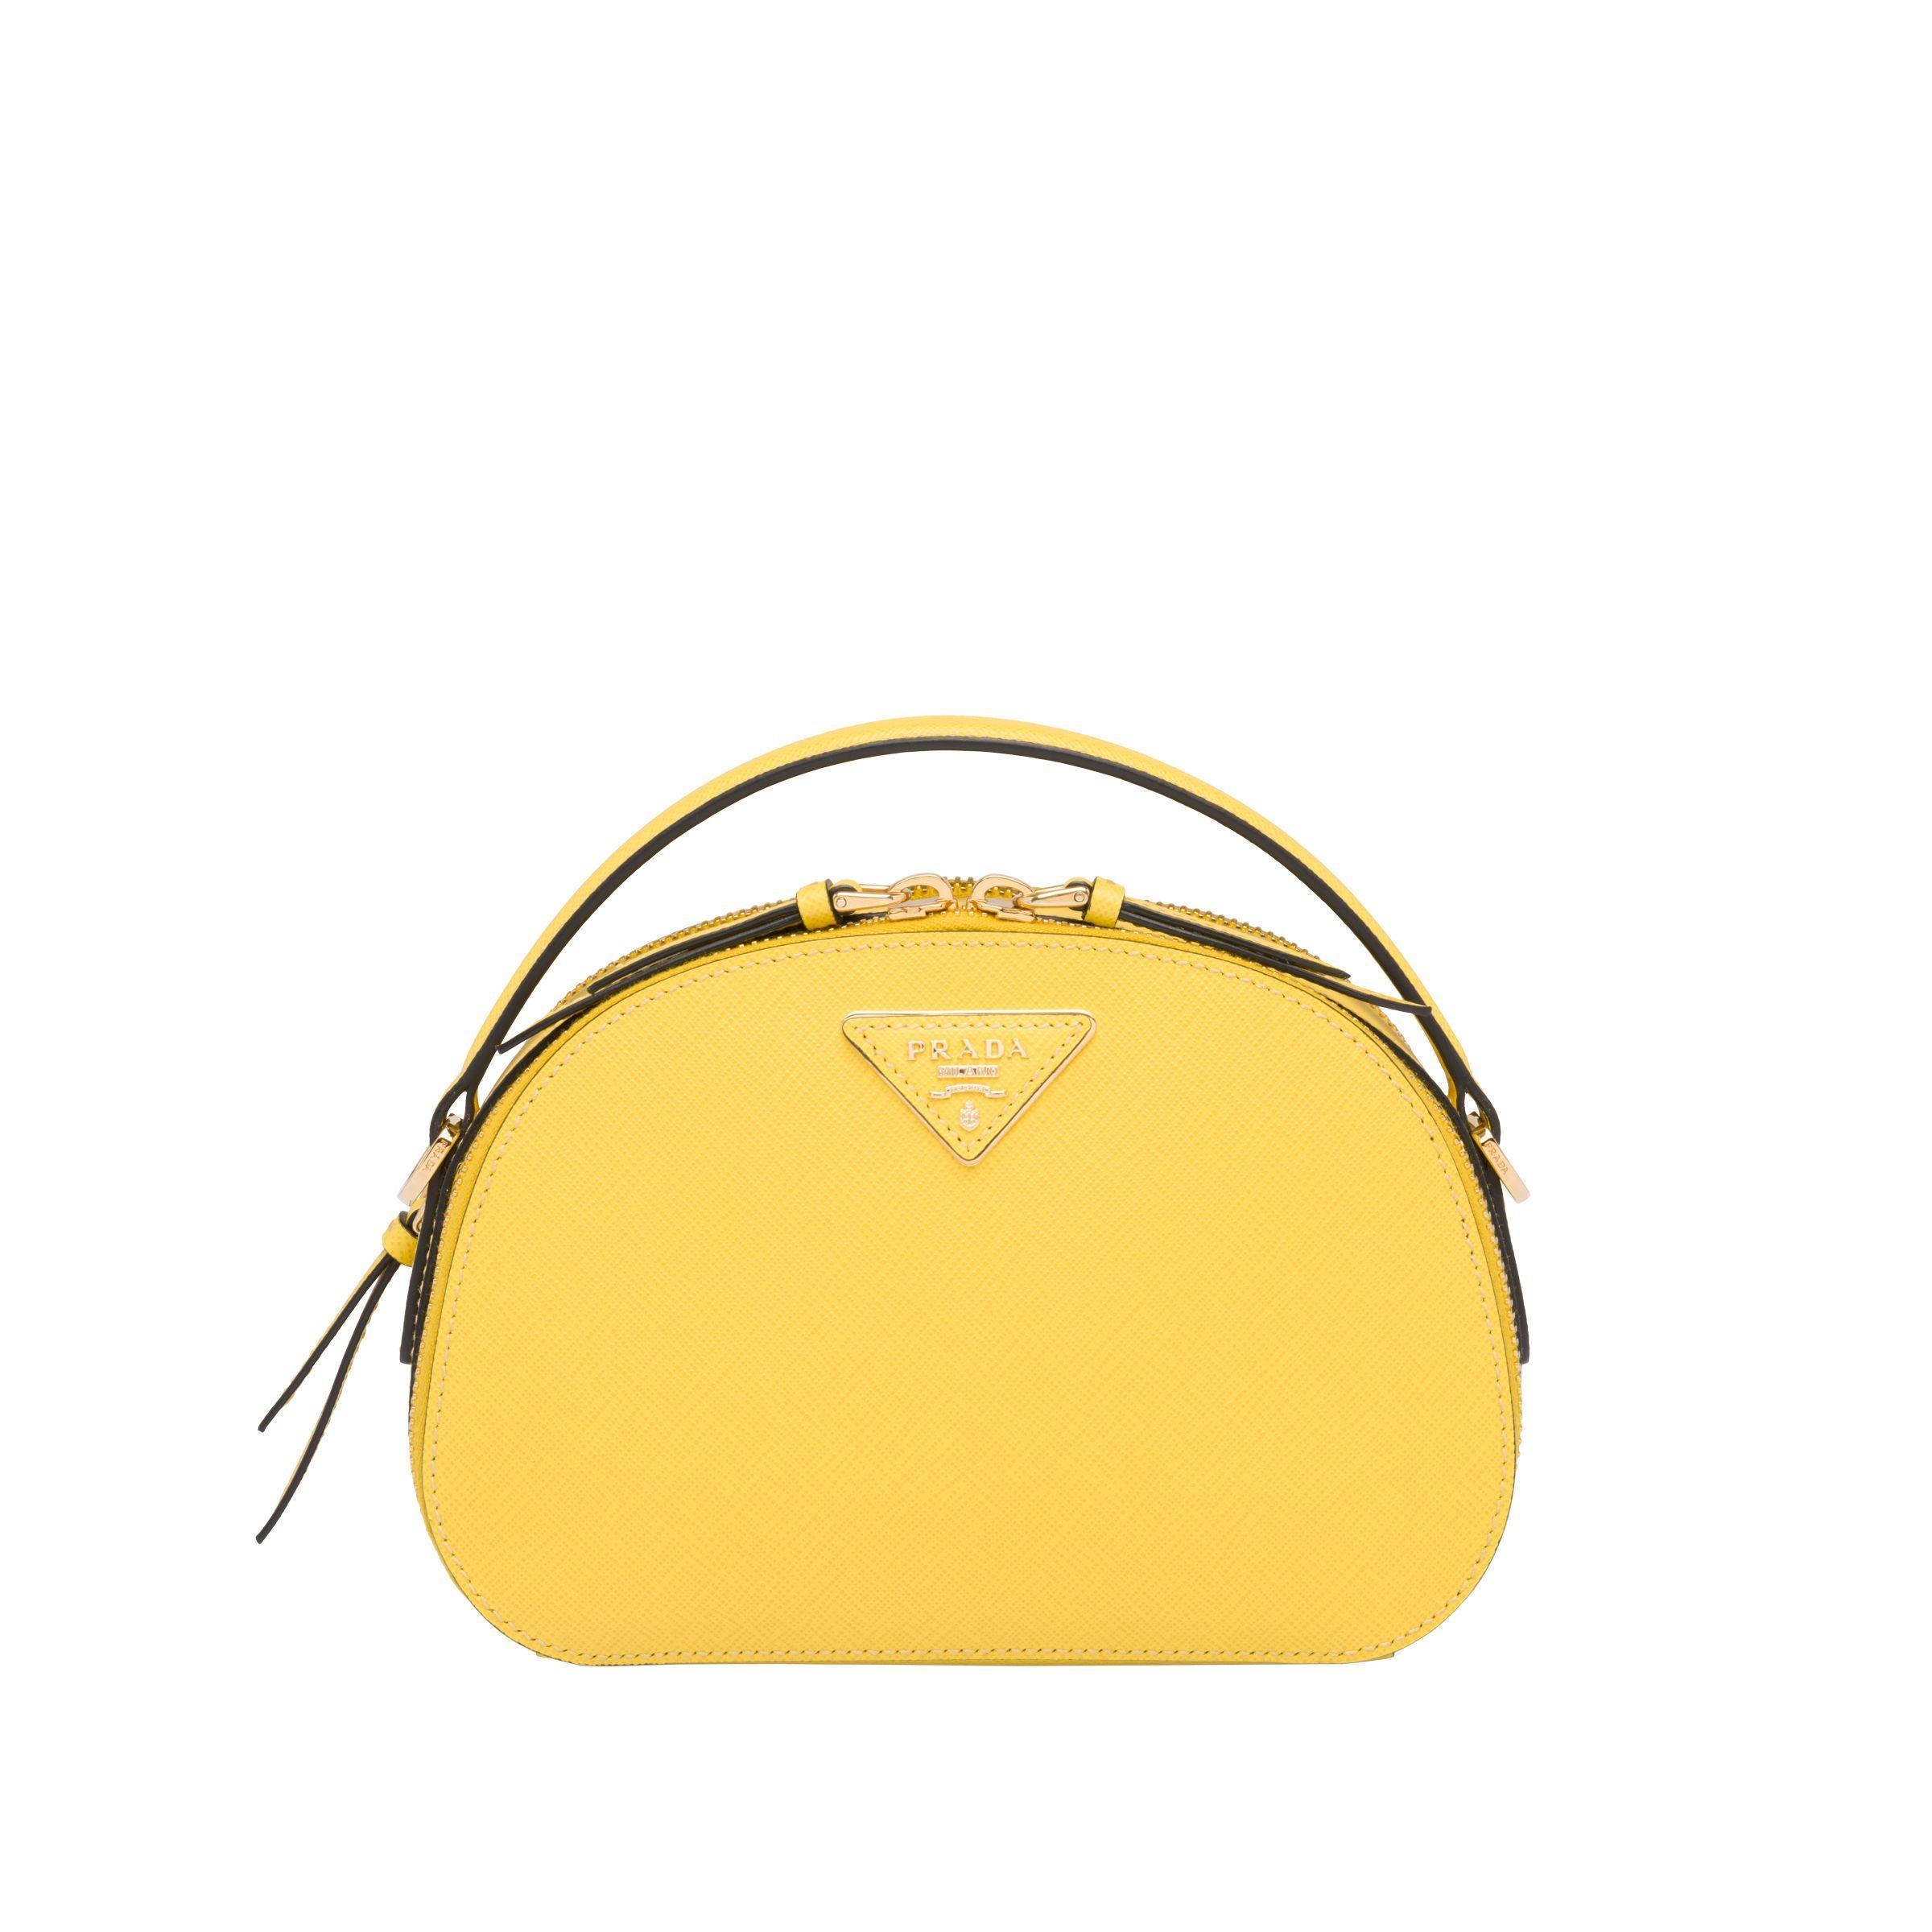 d441713c7a8e65 Prada - Yellow Odette Saffiano Leather Bag - Lyst. View fullscreen